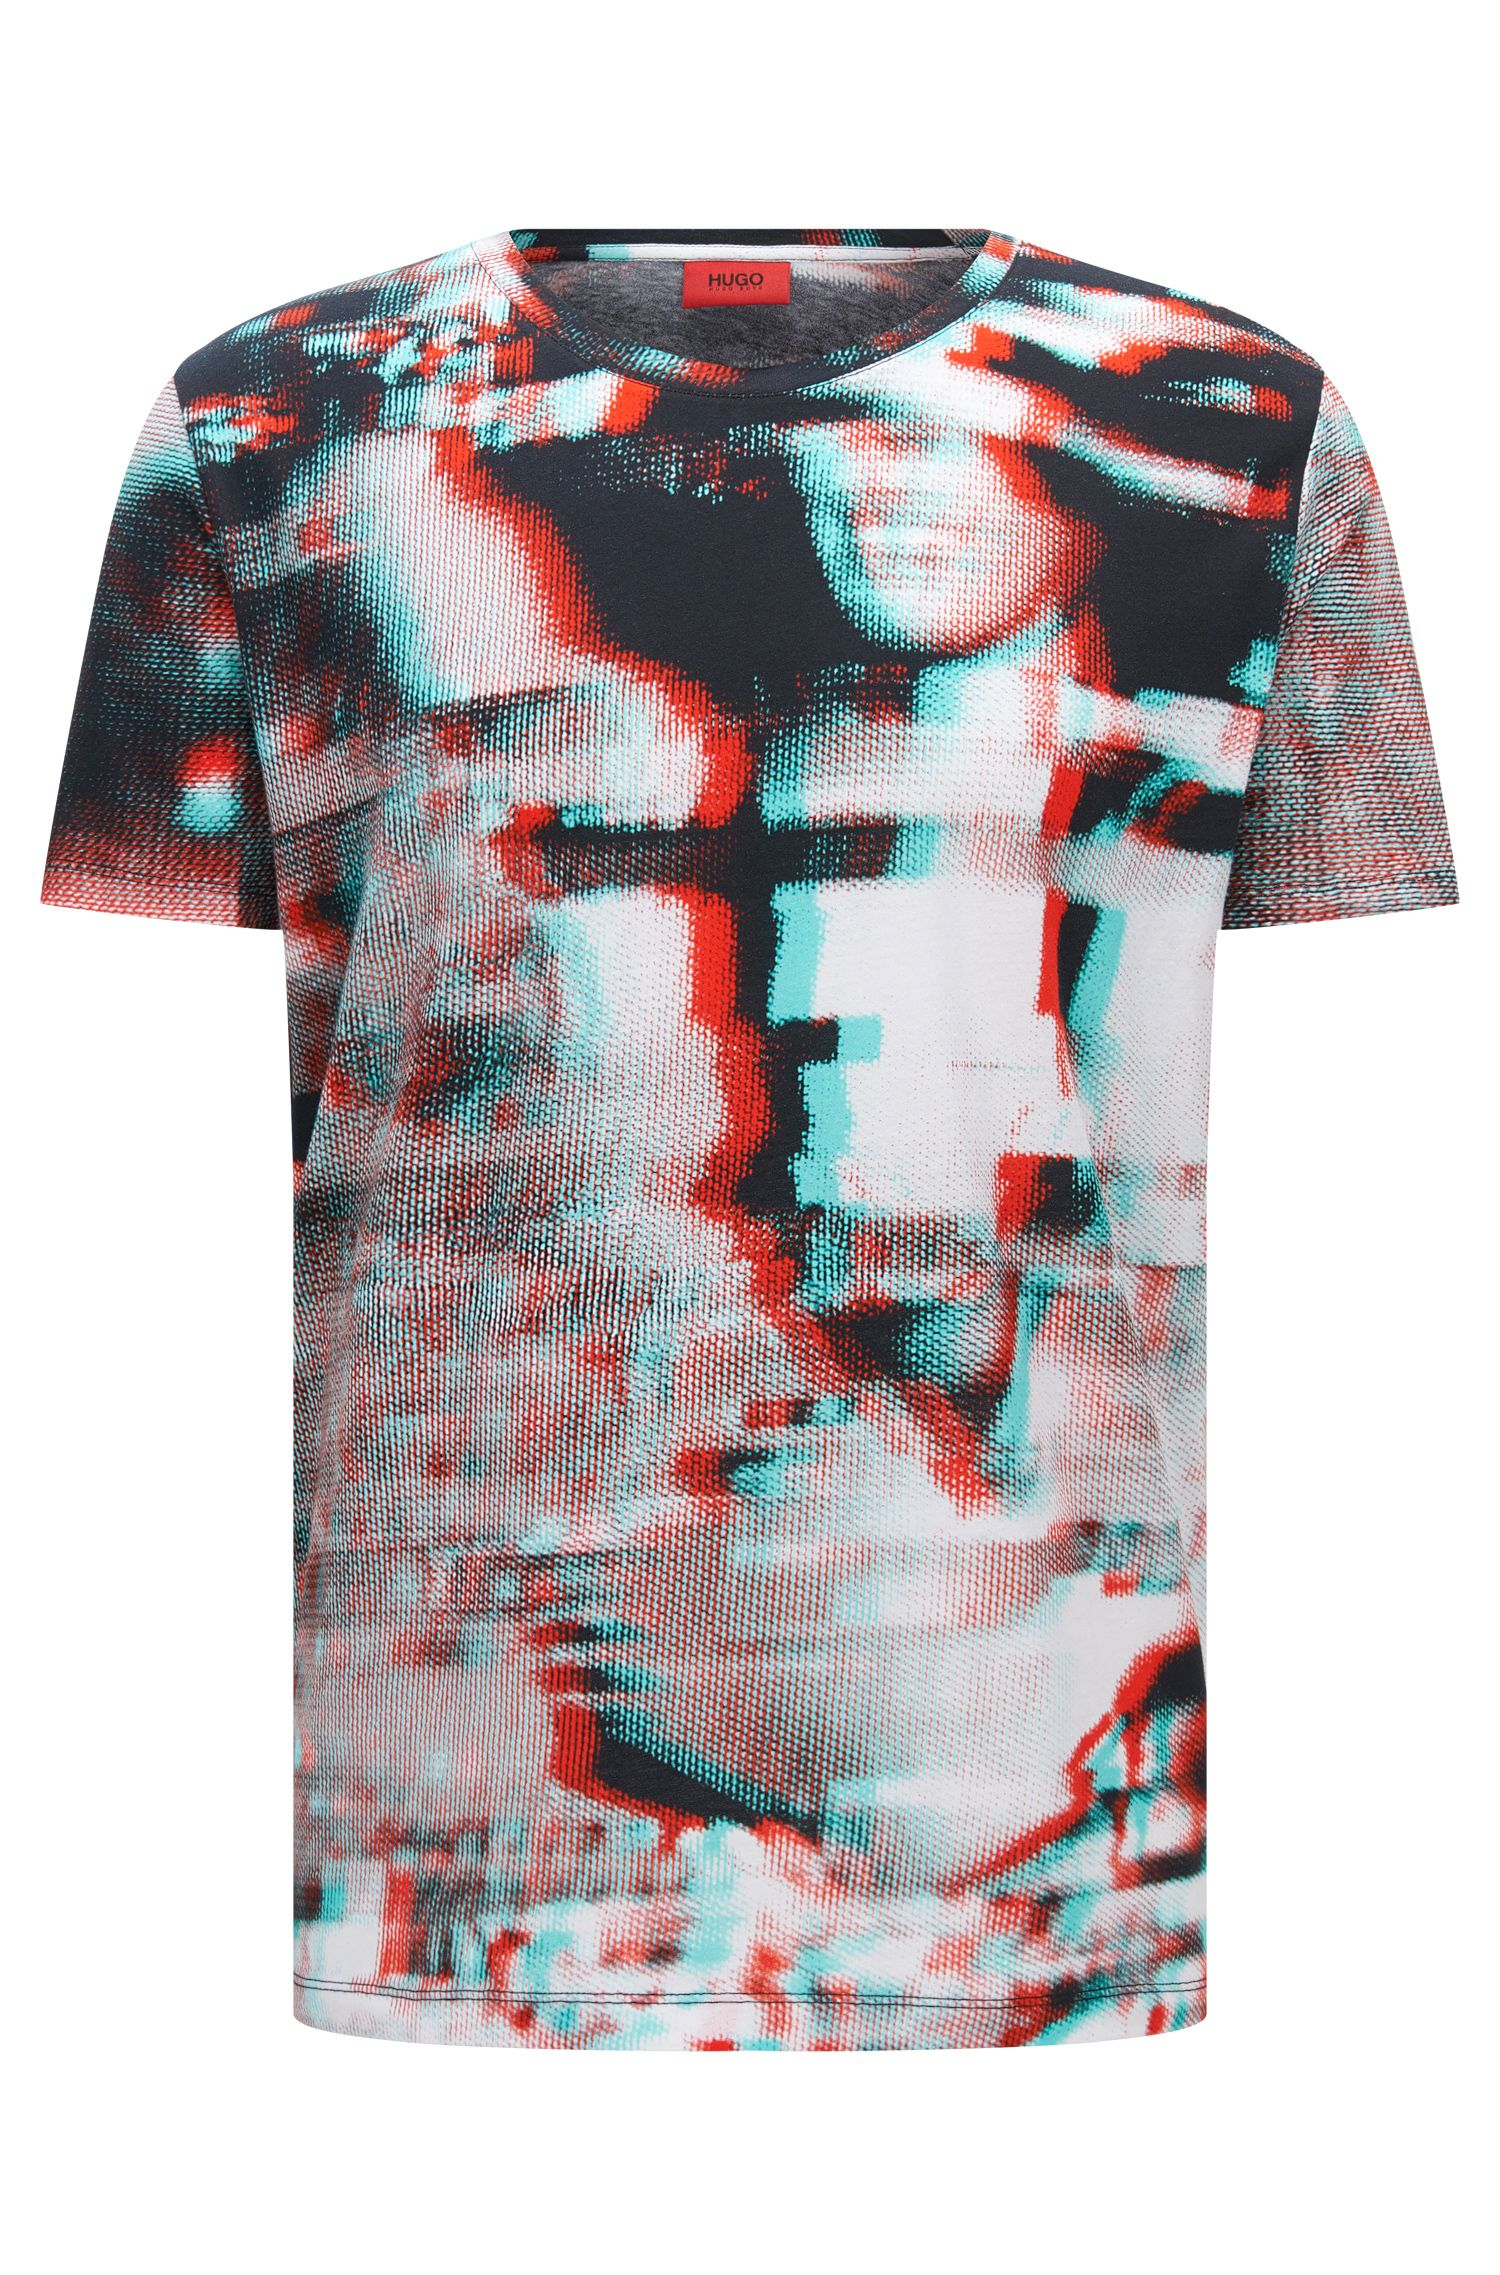 Regular Fit, Cotton T-Shirt | Dilm